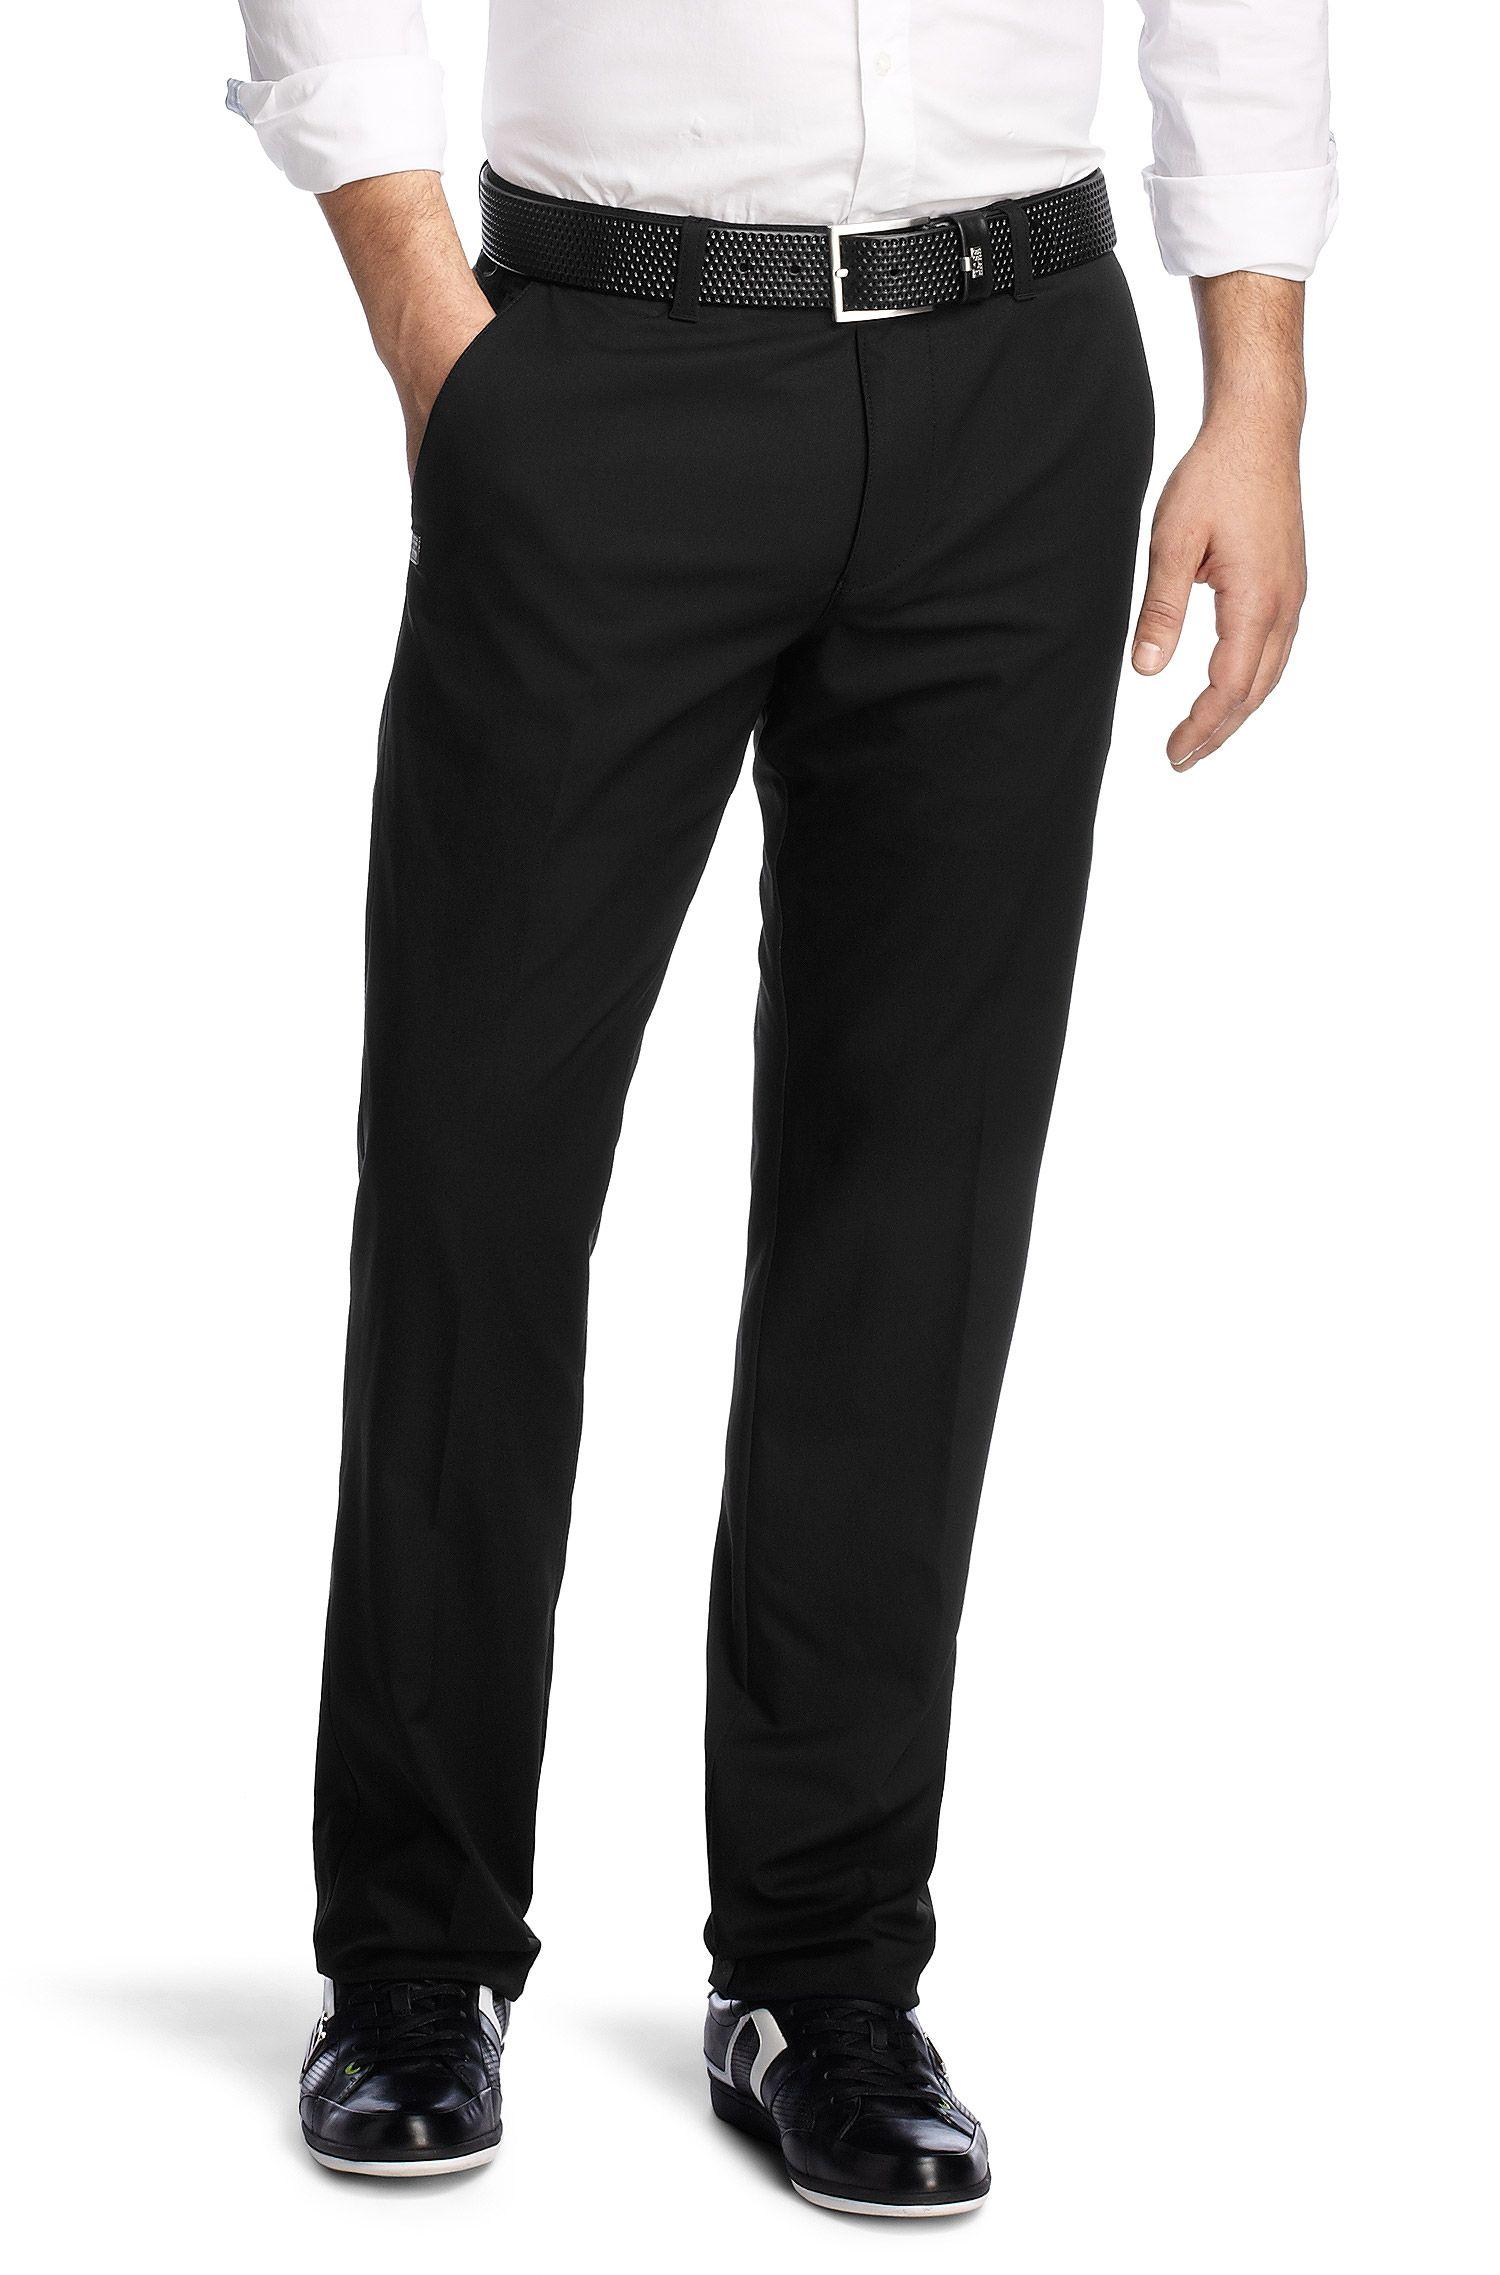 Pantalon avec technologie Coolmax, HaymerPro 6